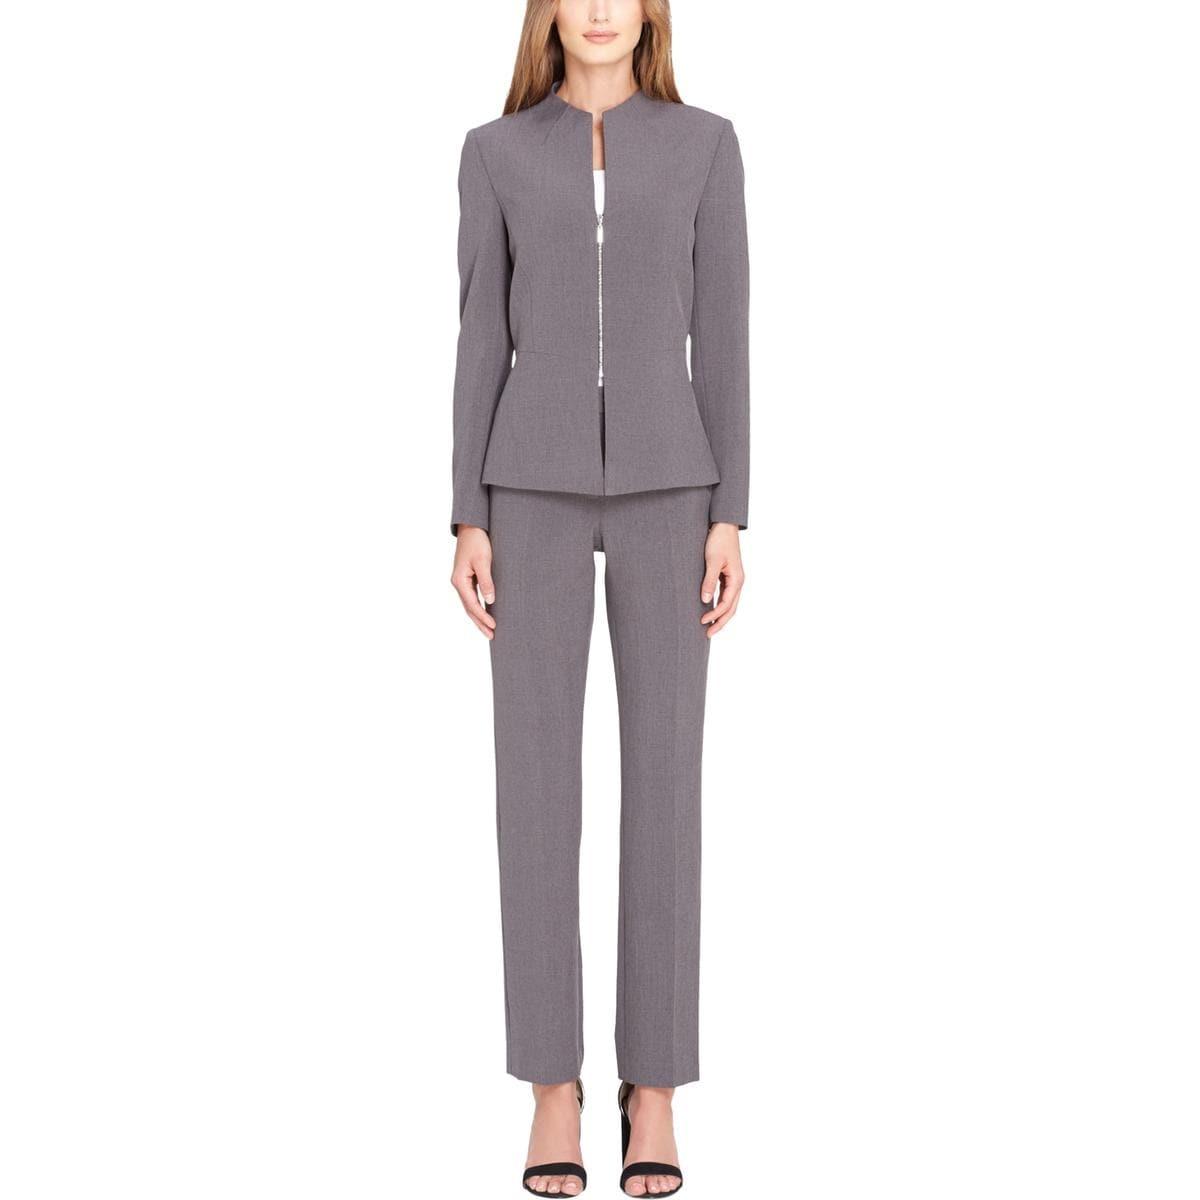 0f23dbd67261 Shop Tahari ASL Womens Pant Suit Zip Front Work Wear - 6 - Free ...